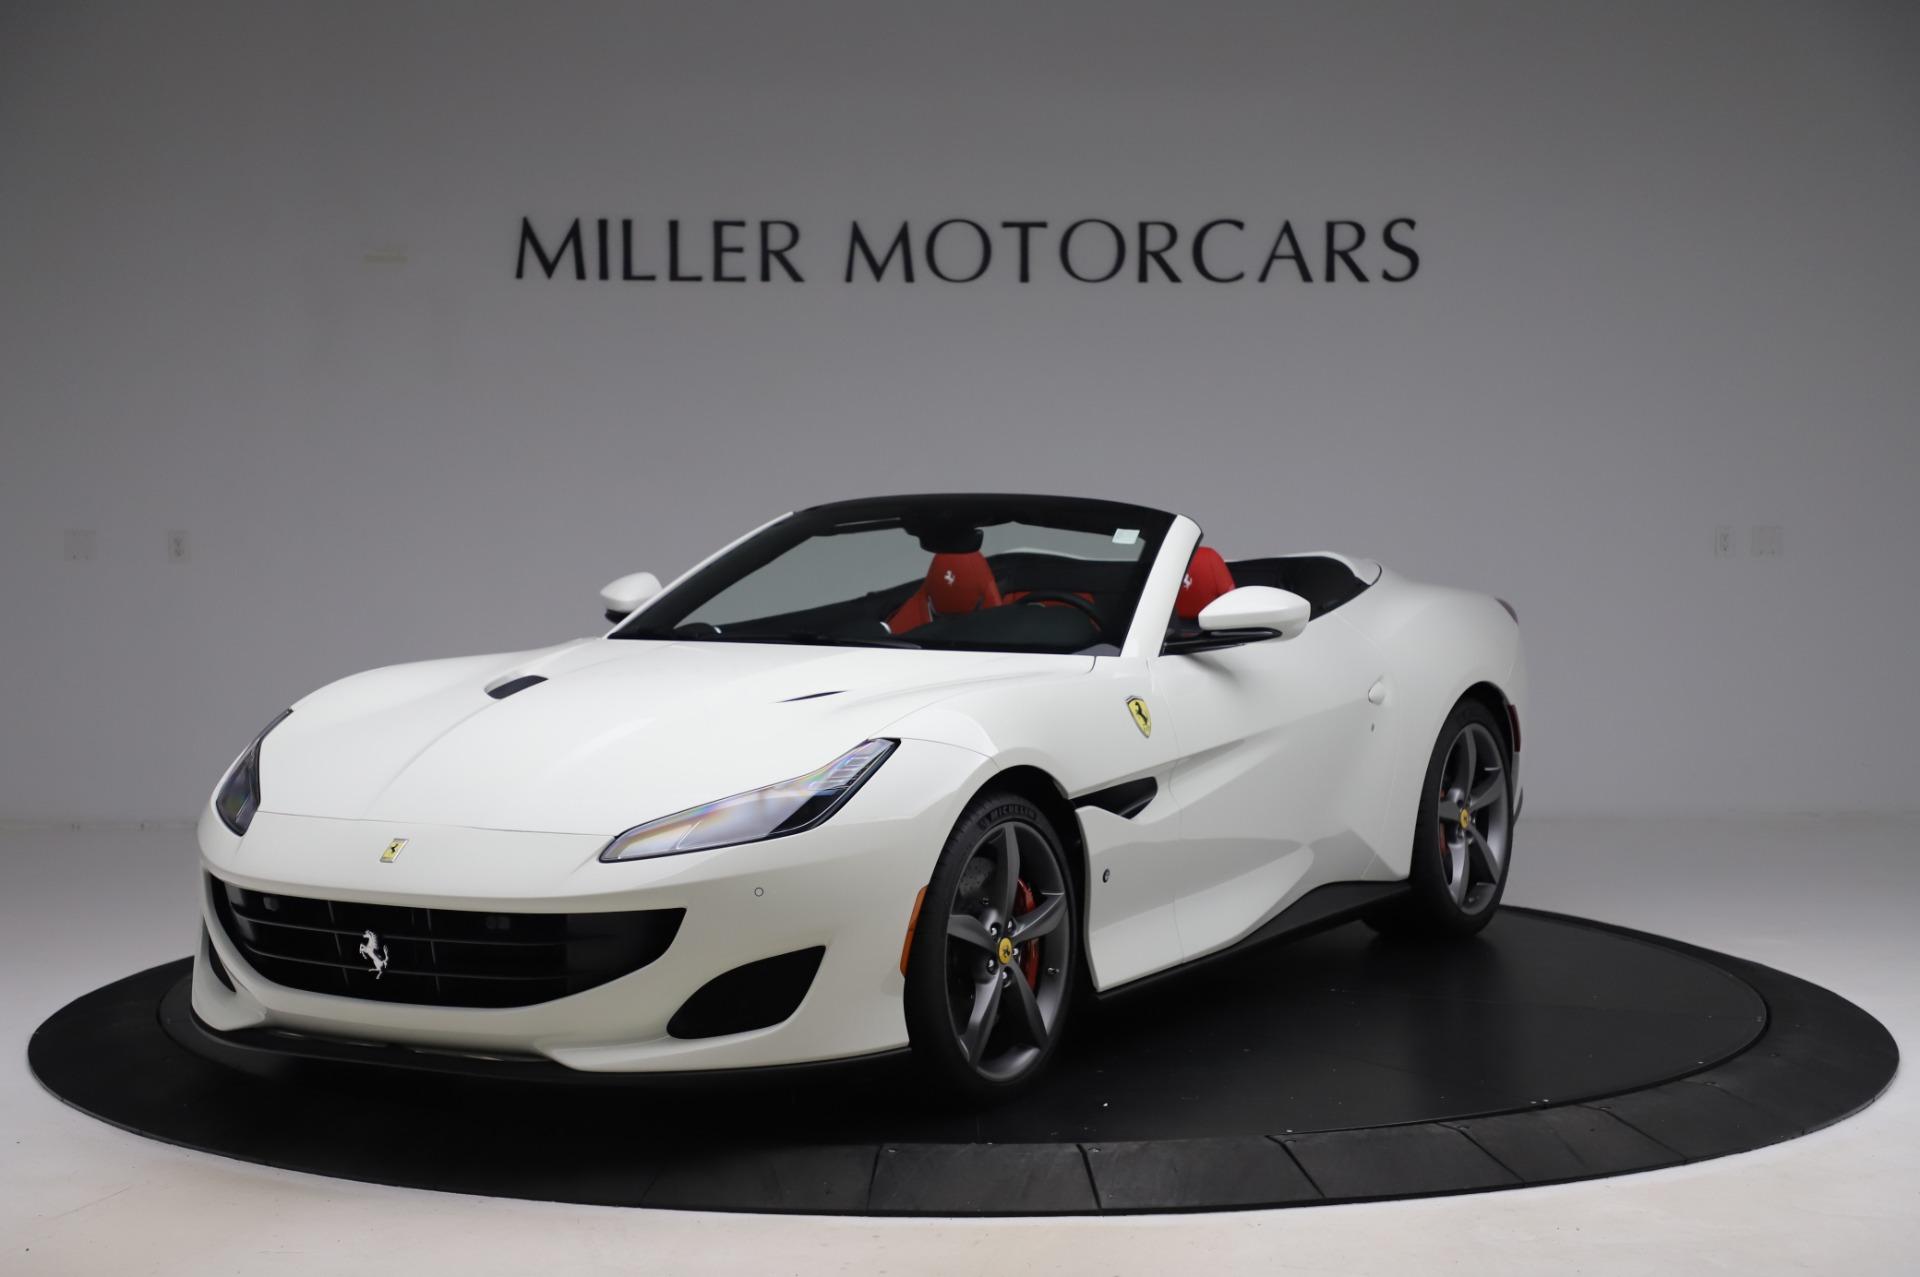 Used 2020 Ferrari Portofino Base for sale Call for price at Bentley Greenwich in Greenwich CT 06830 1